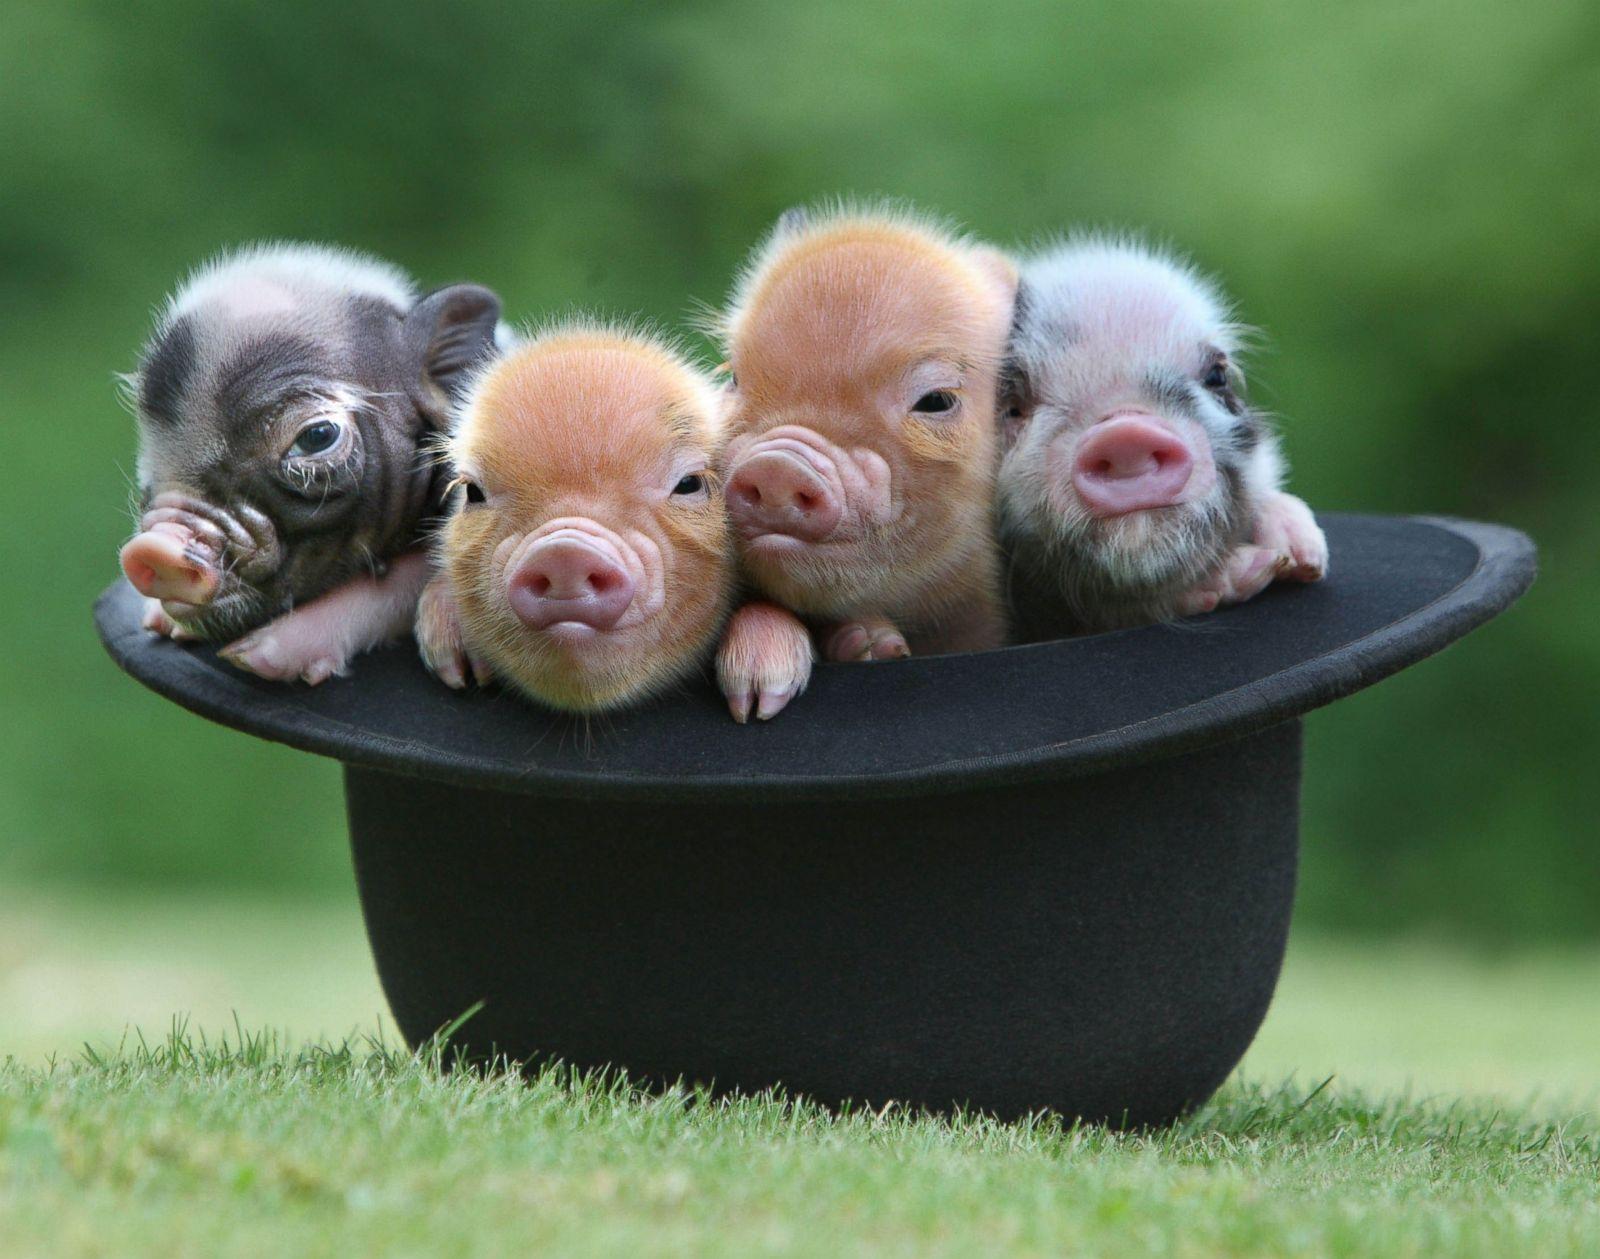 Cute piglet animal